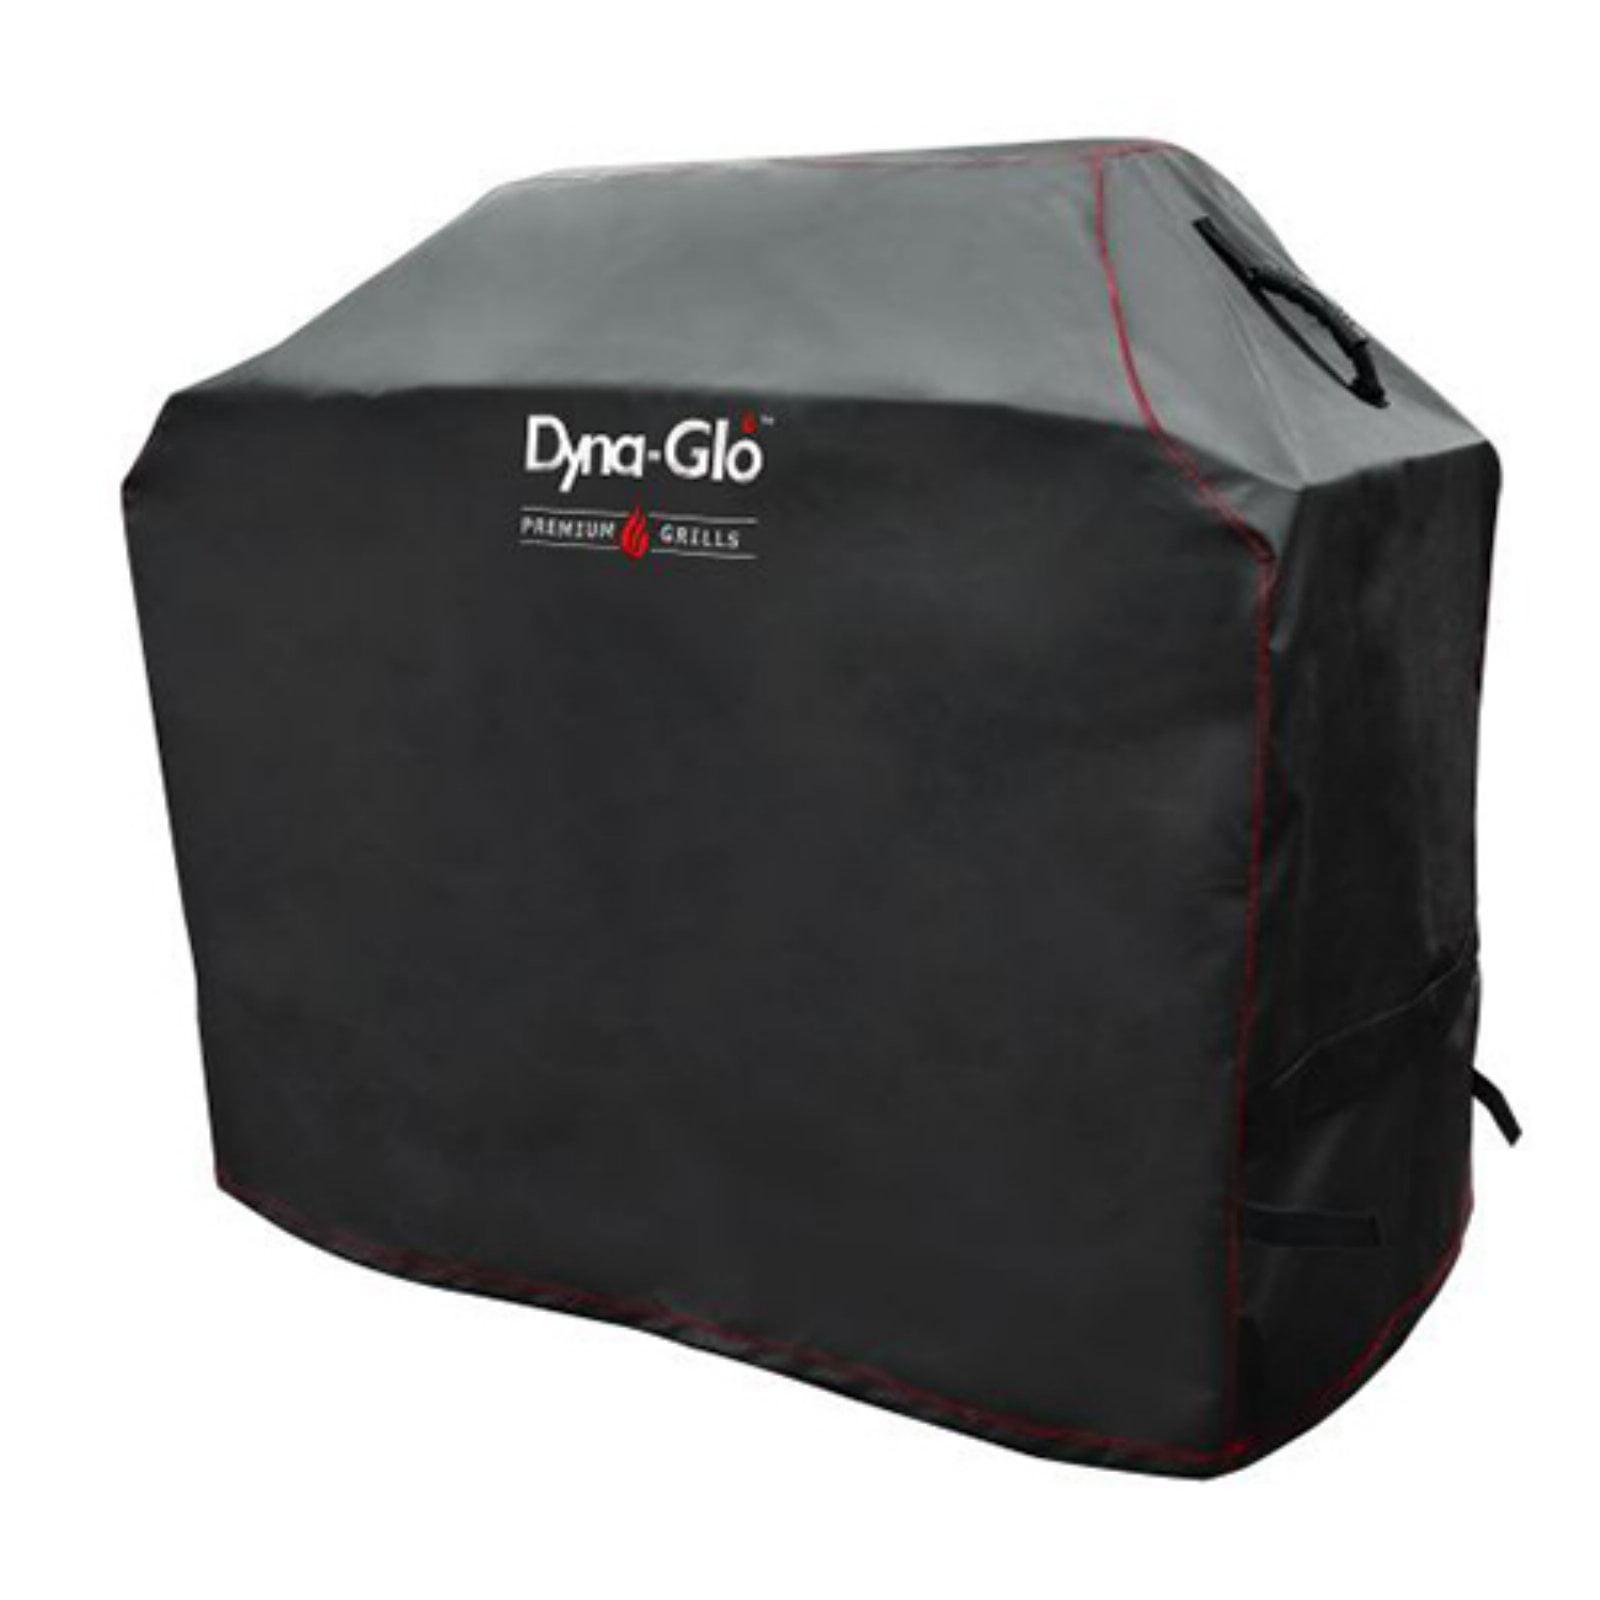 Dyna-Glo DG400C Premium Grill Cover for 4-Burner Grill